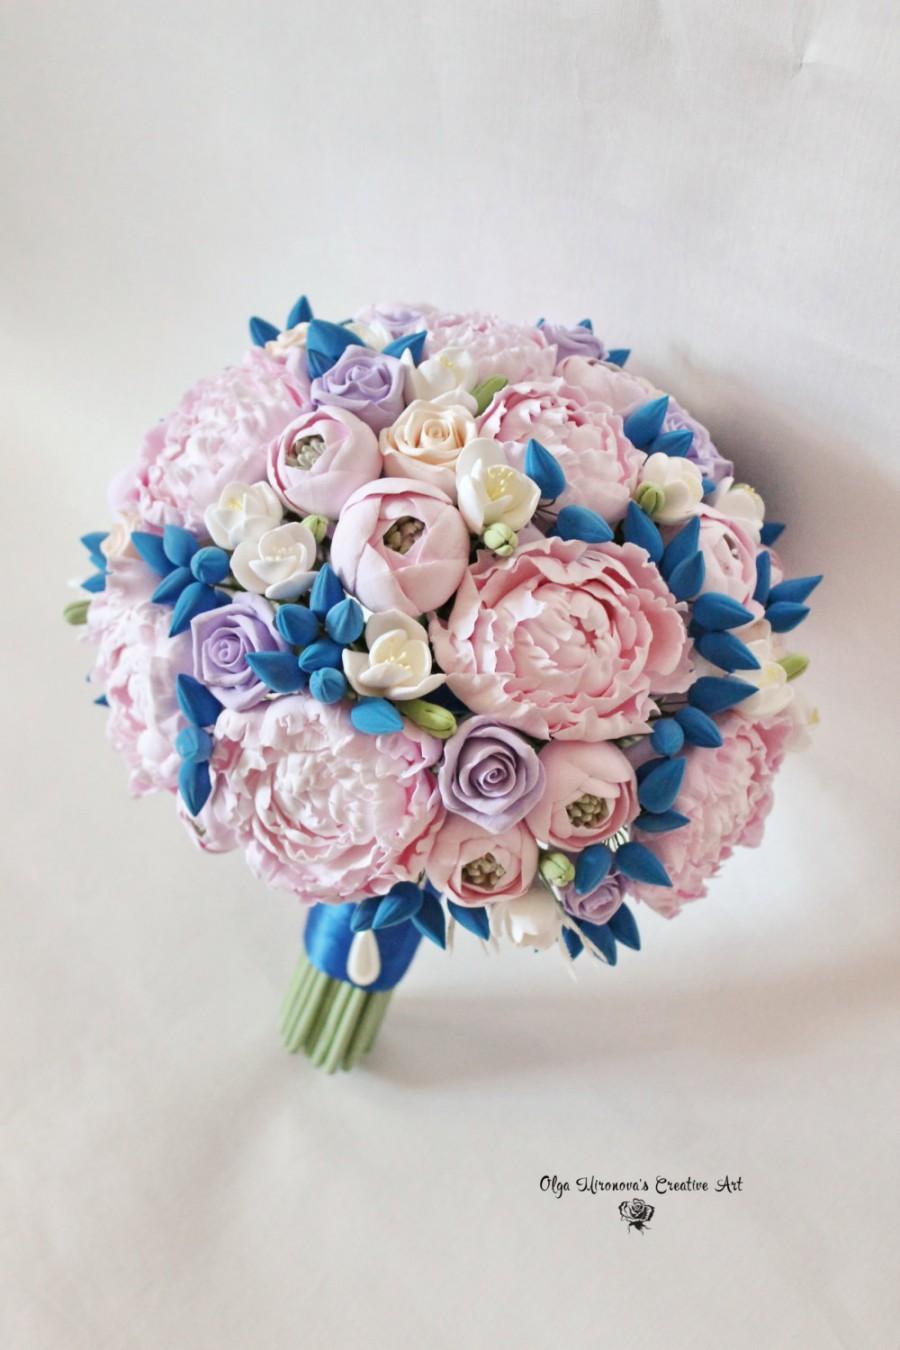 Wedding bouquet bridal peony bouquet pink blue bouquet keepsake wedding bouquet bridal peony bouquet pink blue bouquet keepsake alternative bouquet gorgeous wedding flowers izmirmasajfo